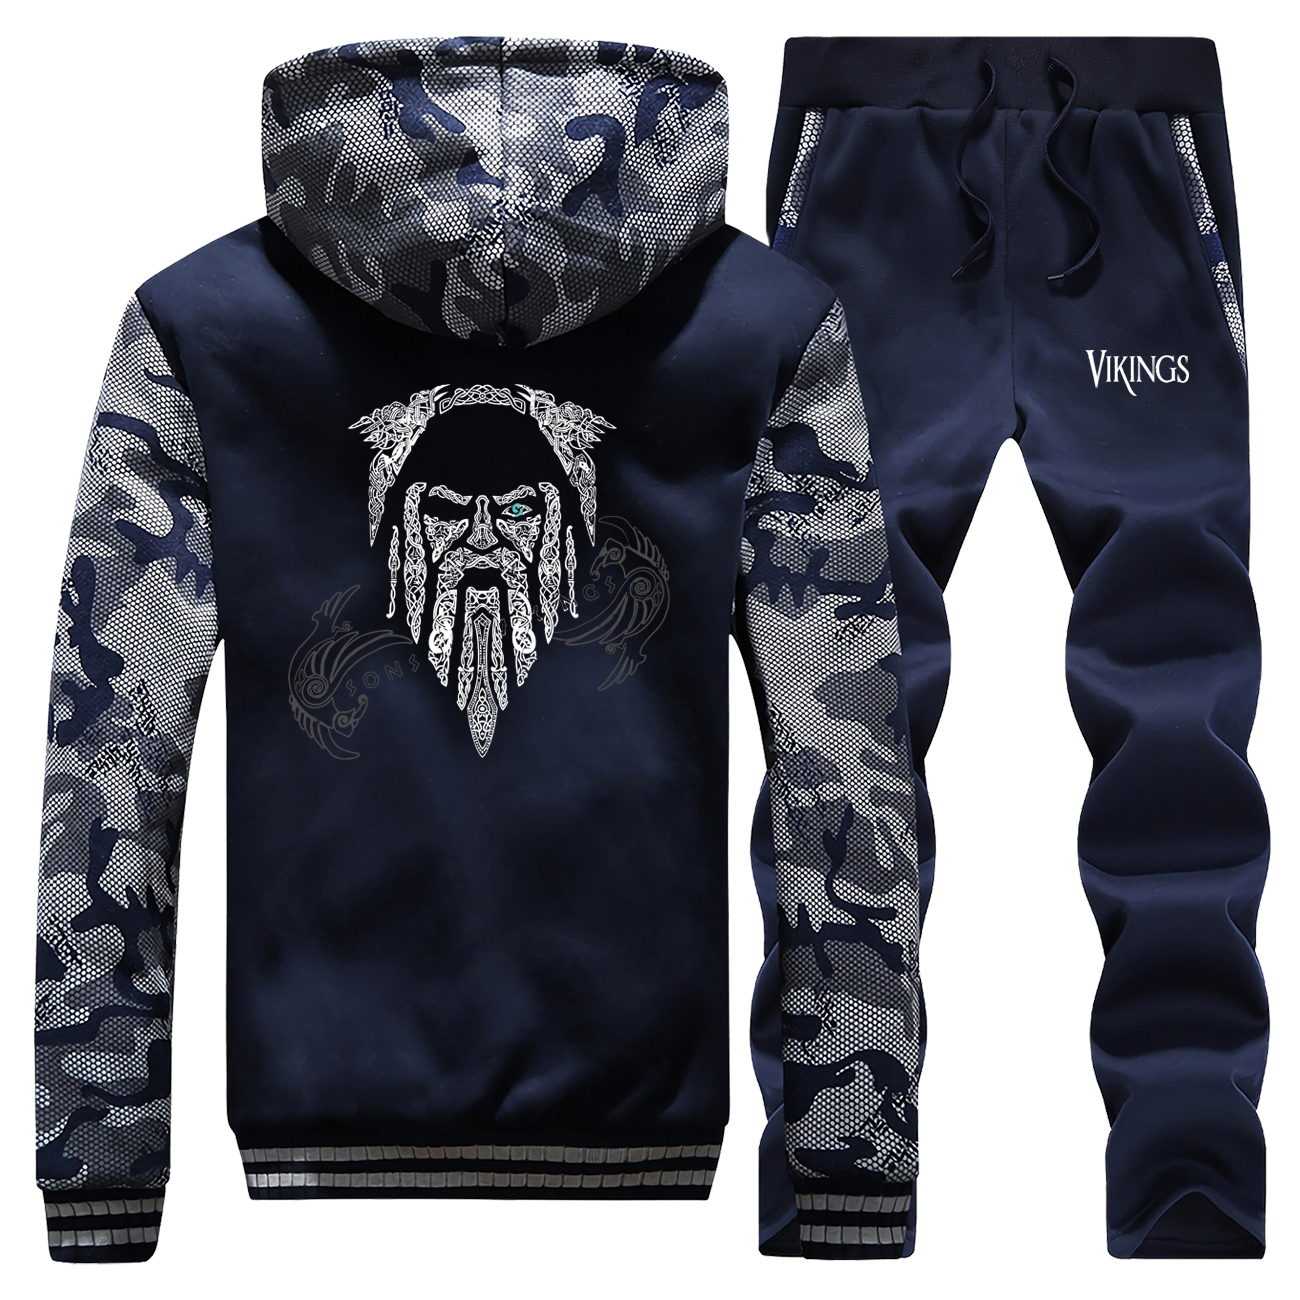 Men's 2019 New Fashion Winter Men Clothing Thick VIKINGS Hooded Outerwear + Pants Set Tide Jacket Set Man Clothing